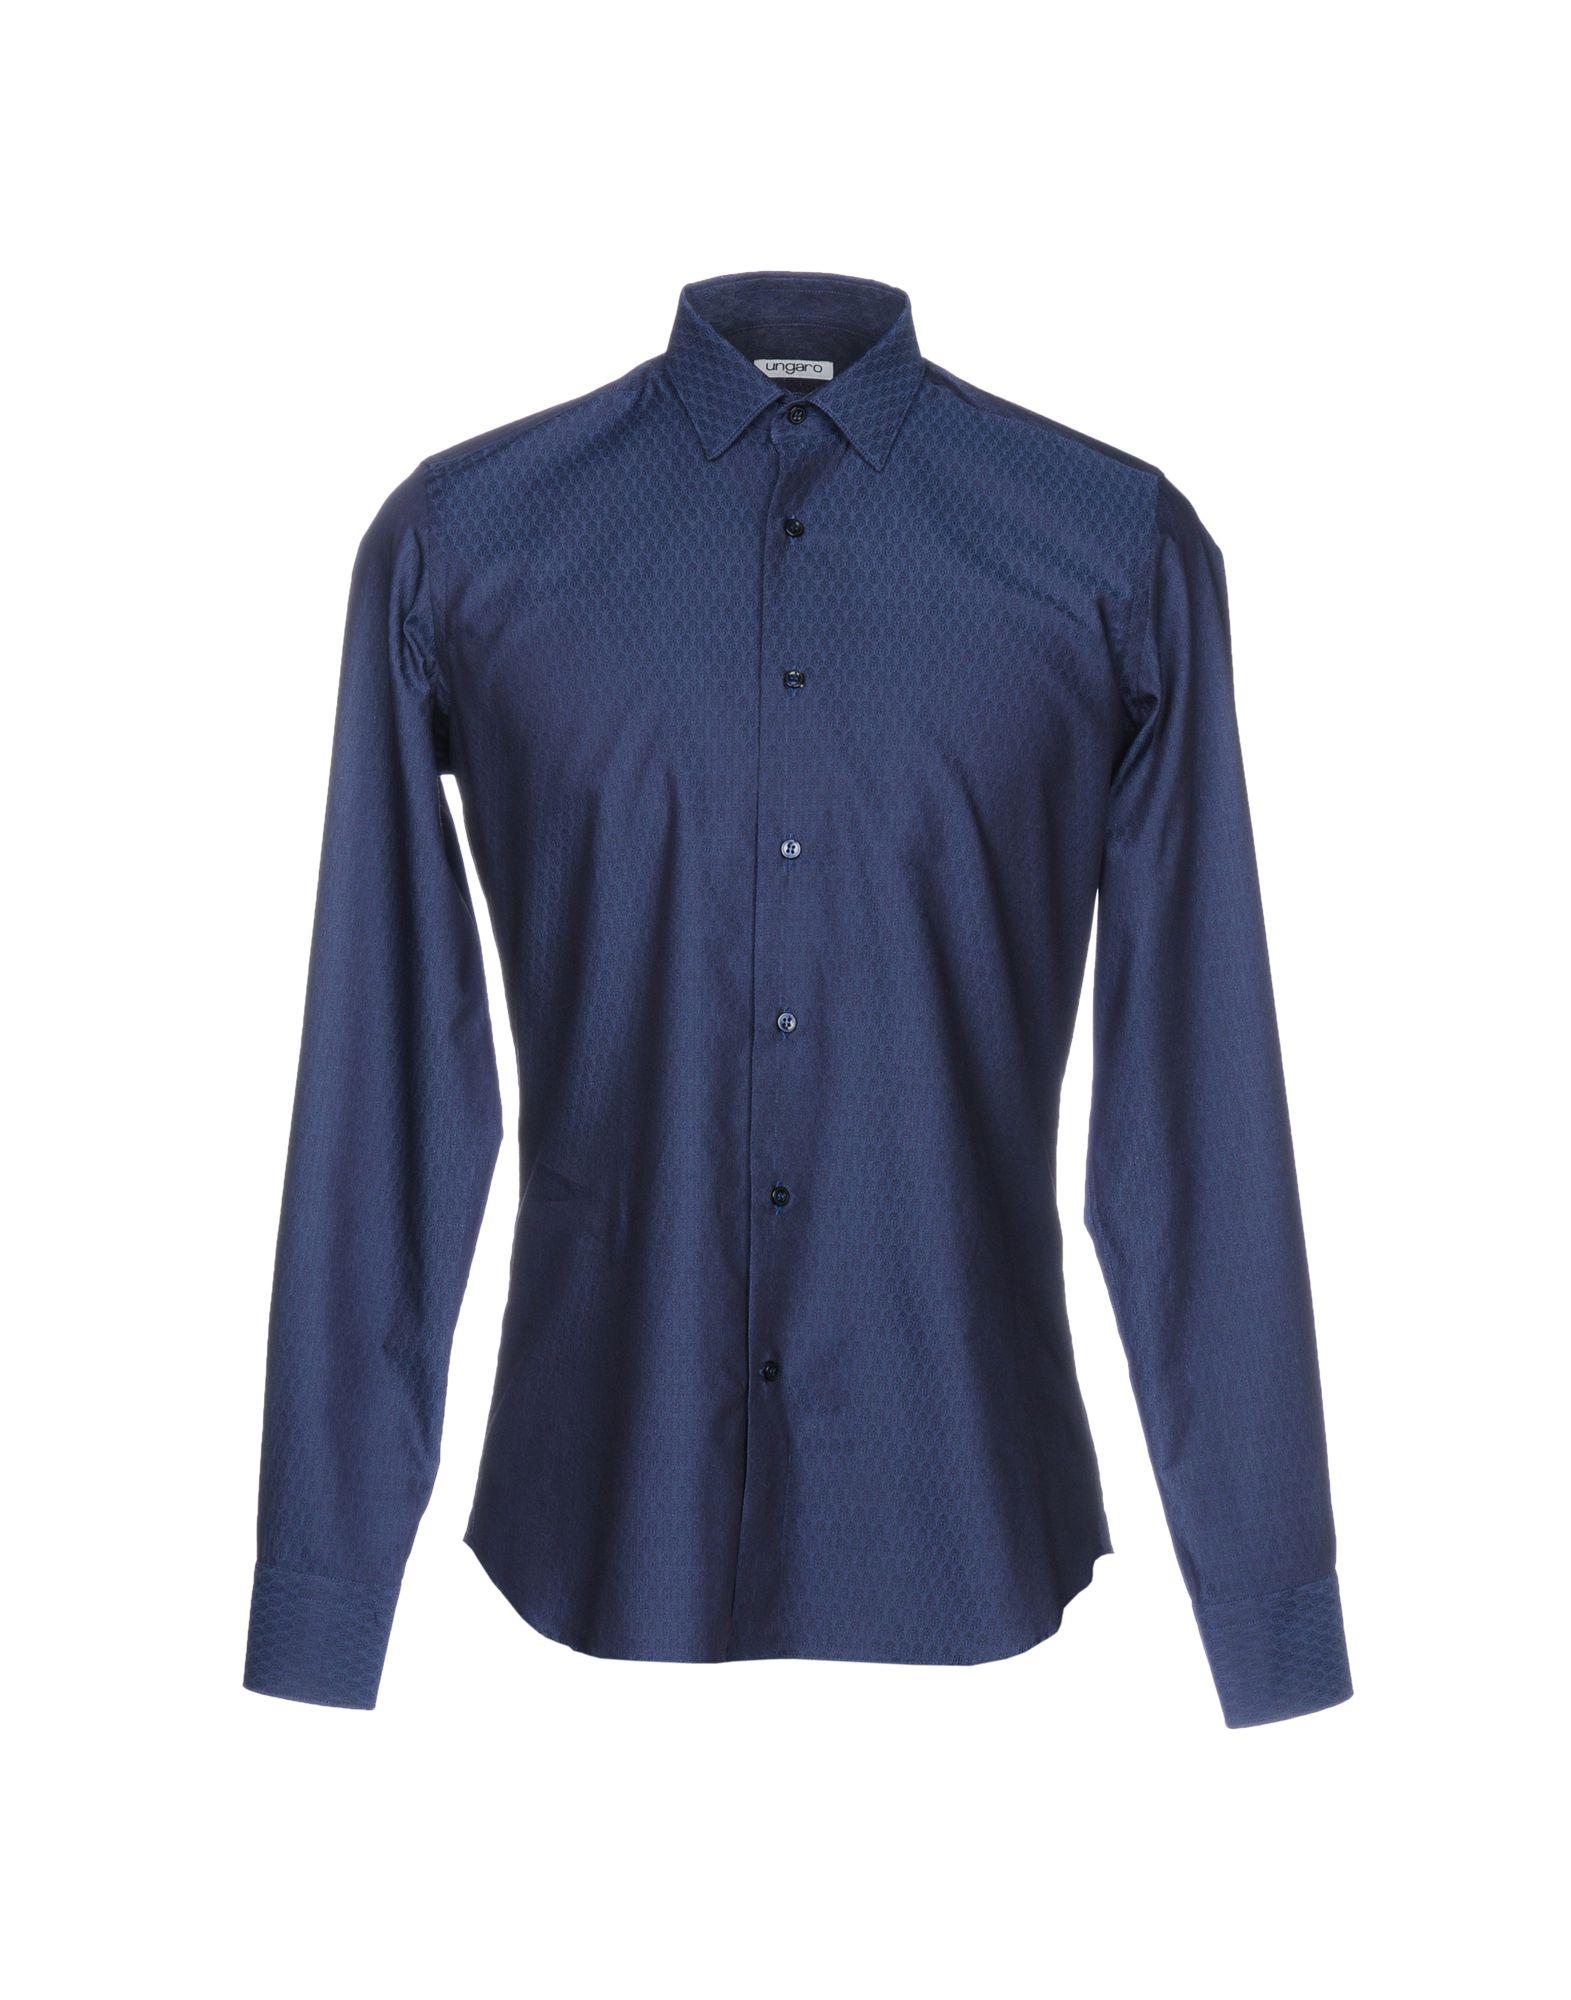 Camicia Tinta Uomo Unita Ungaro Uomo Tinta - 38760577CB f4caaf